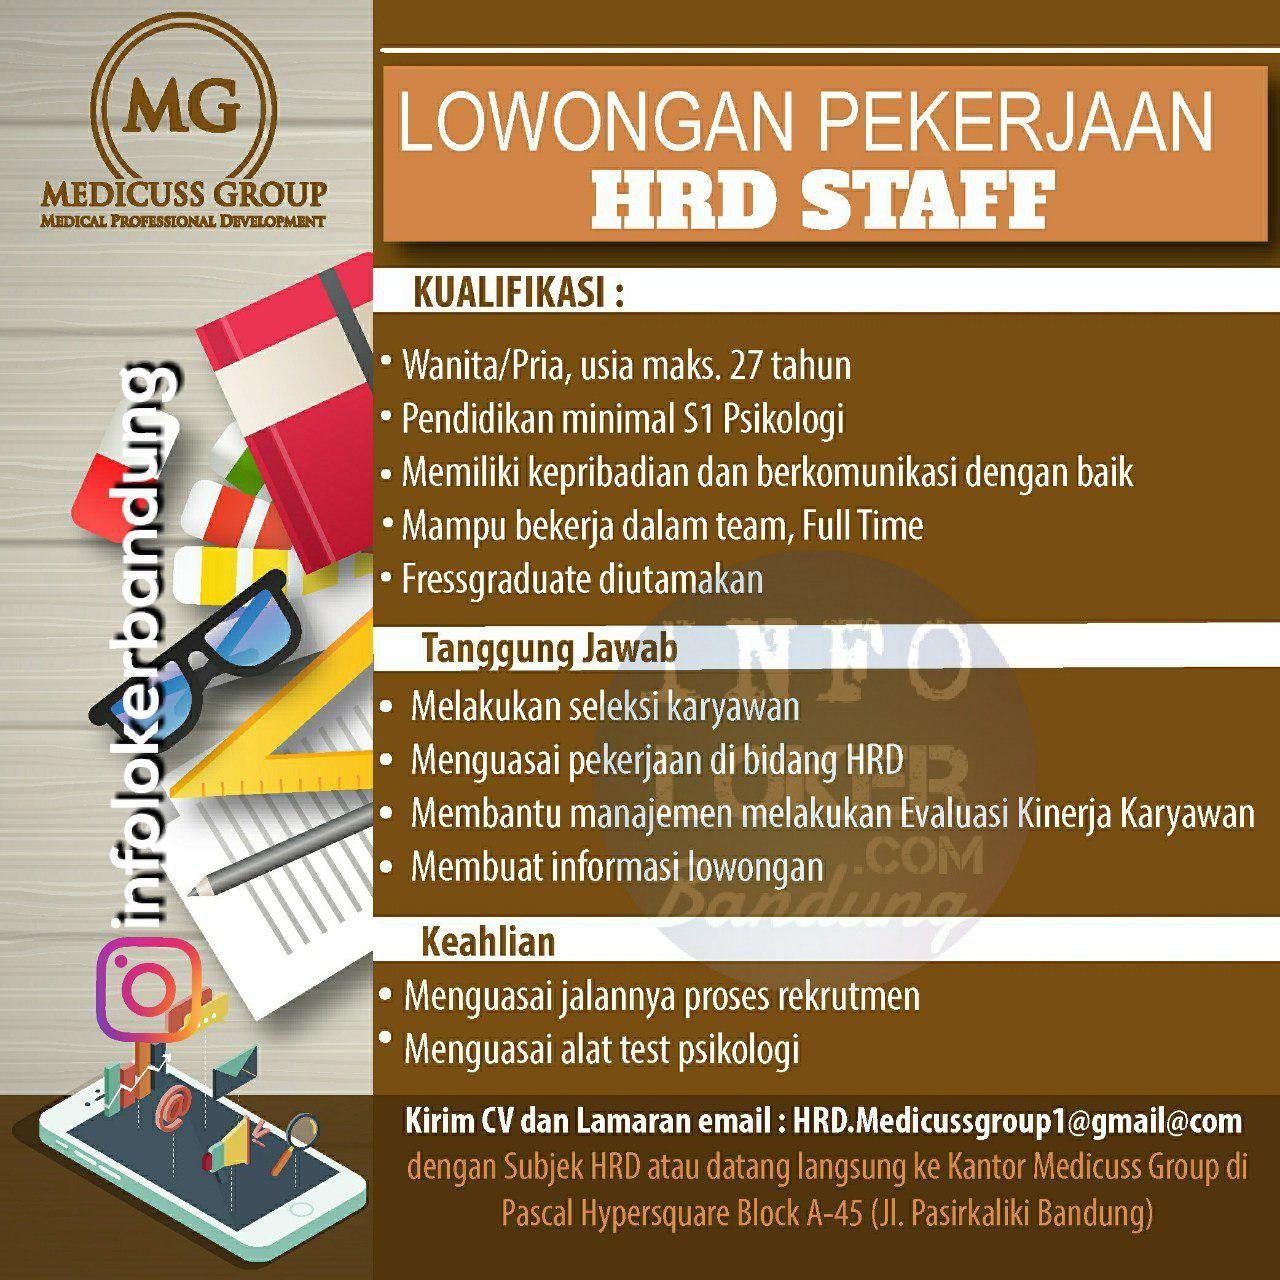 Lowongan Kerja Hrd Staff Medicuss Group Bandung Mei 2018 Mei